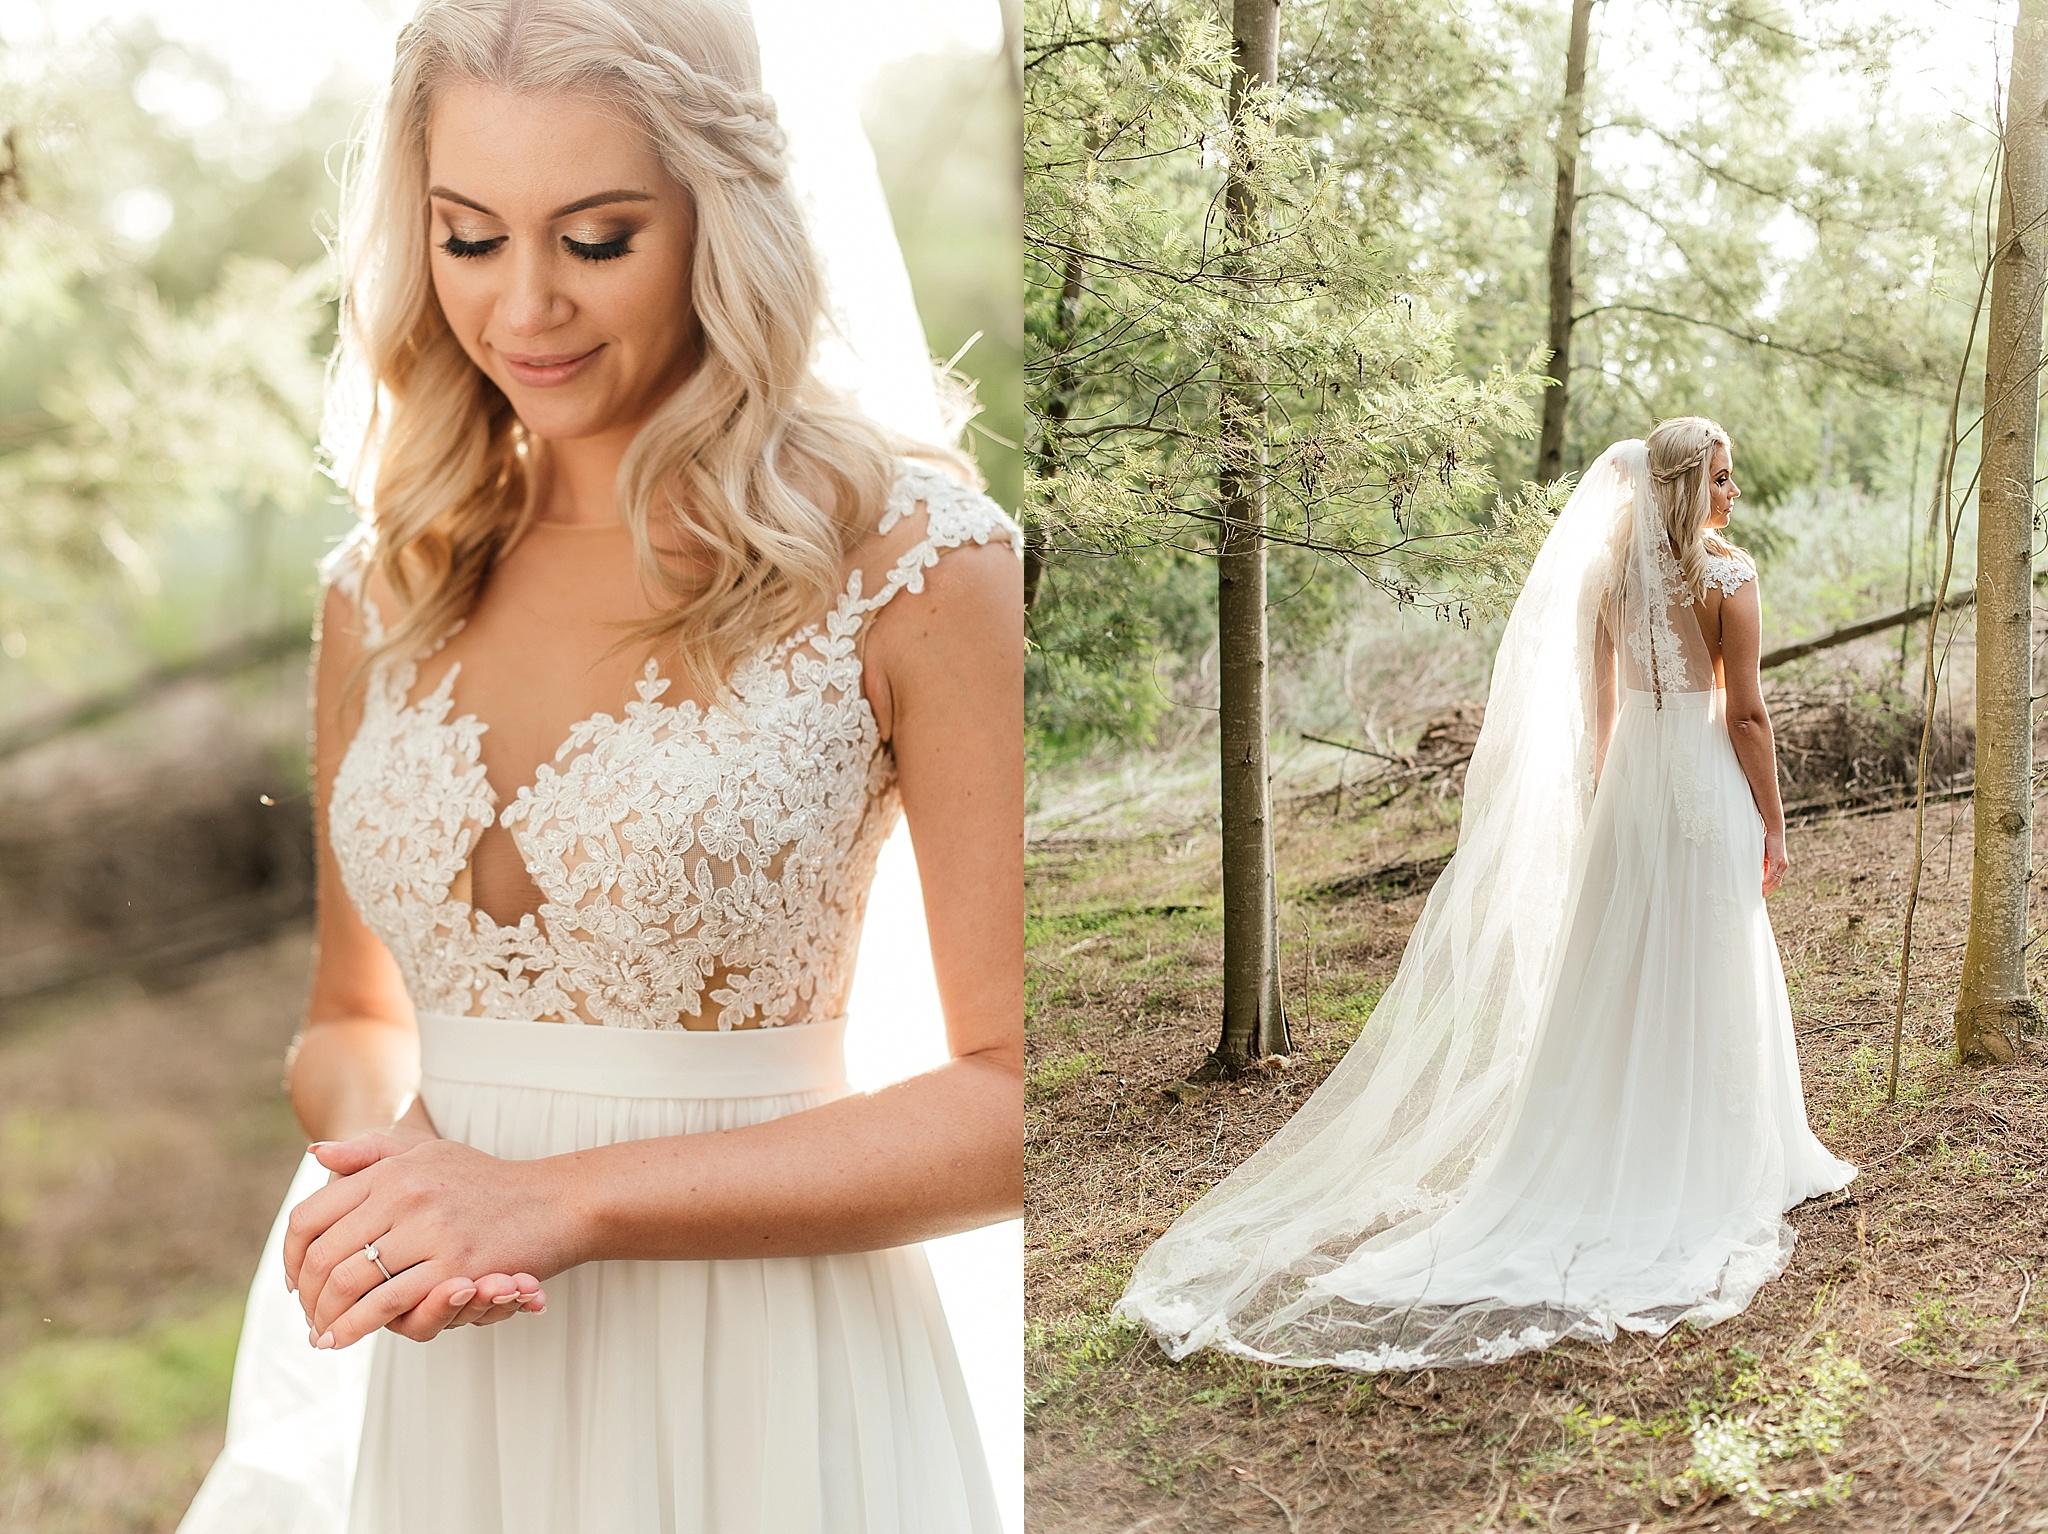 Cape Town Photographer Darren Bester - Die Woud Wedding - Gareth & Roxanne_0029.jpg